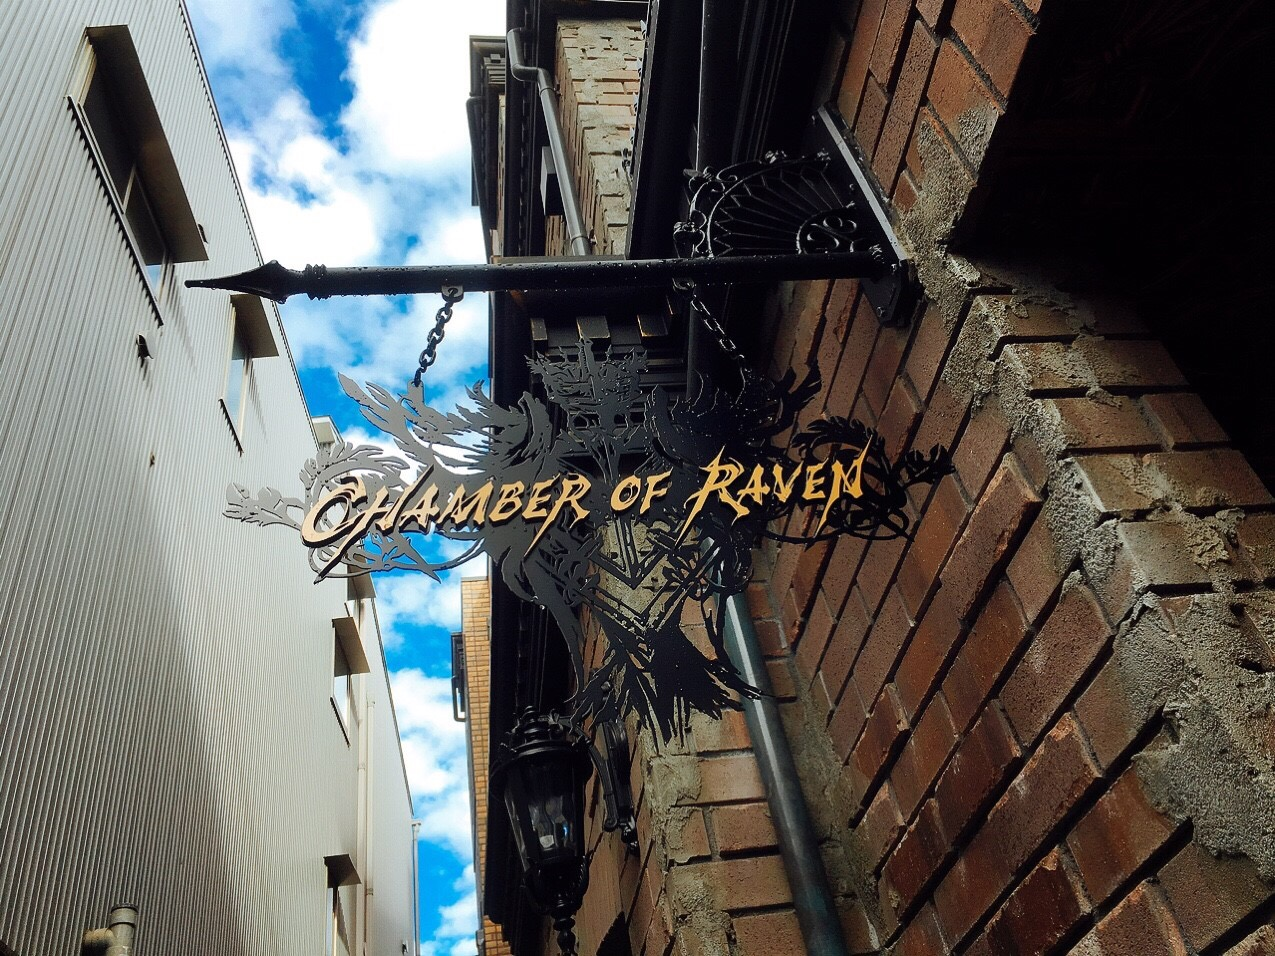 CHAMBER OF RAVEN